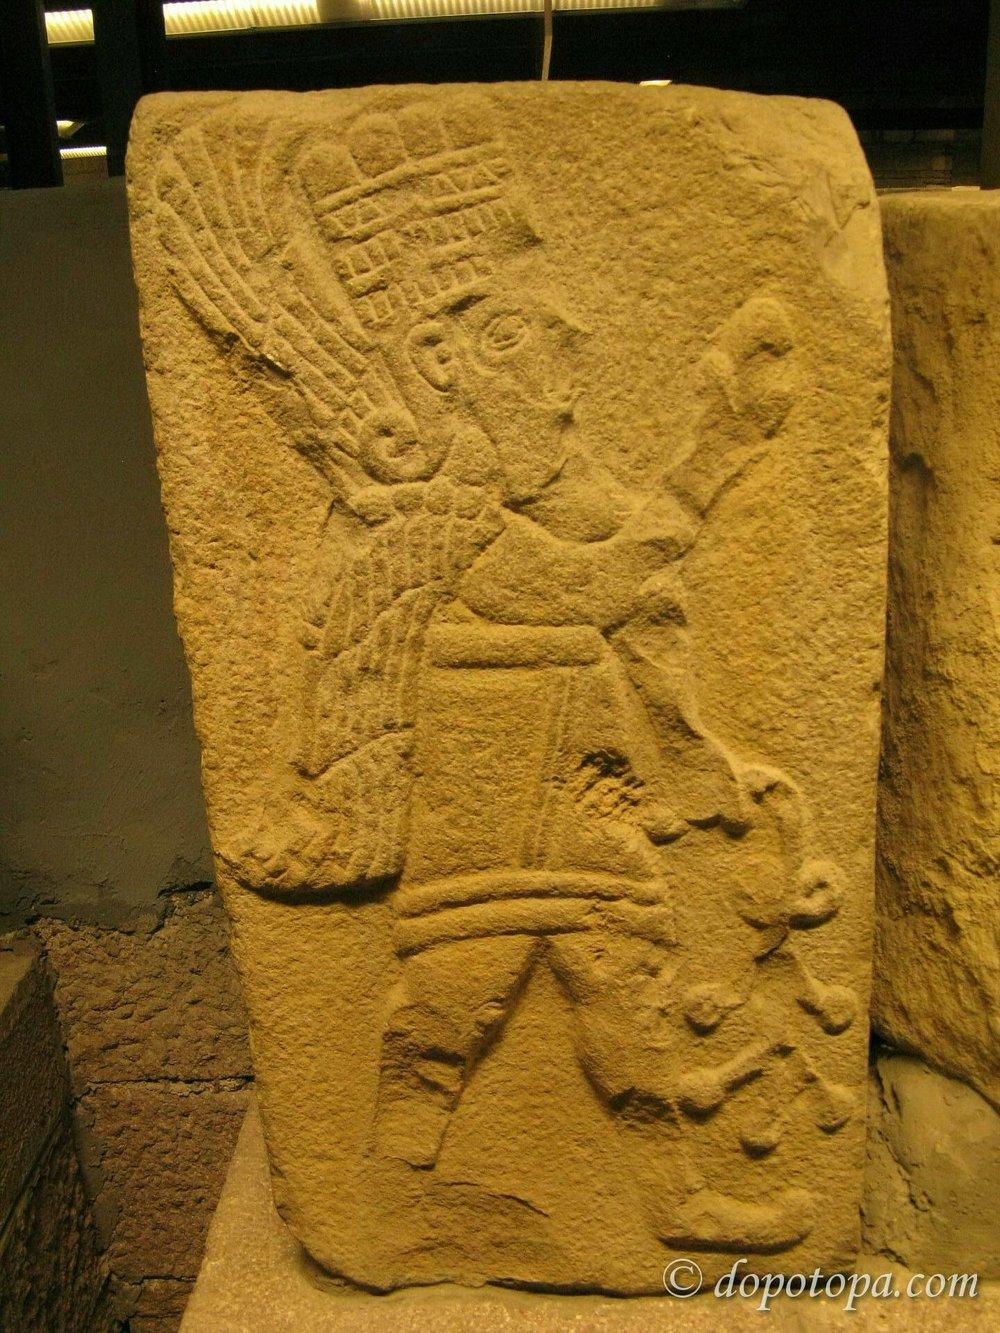 ankara_museum_stone_artefacts_005_1.JPG